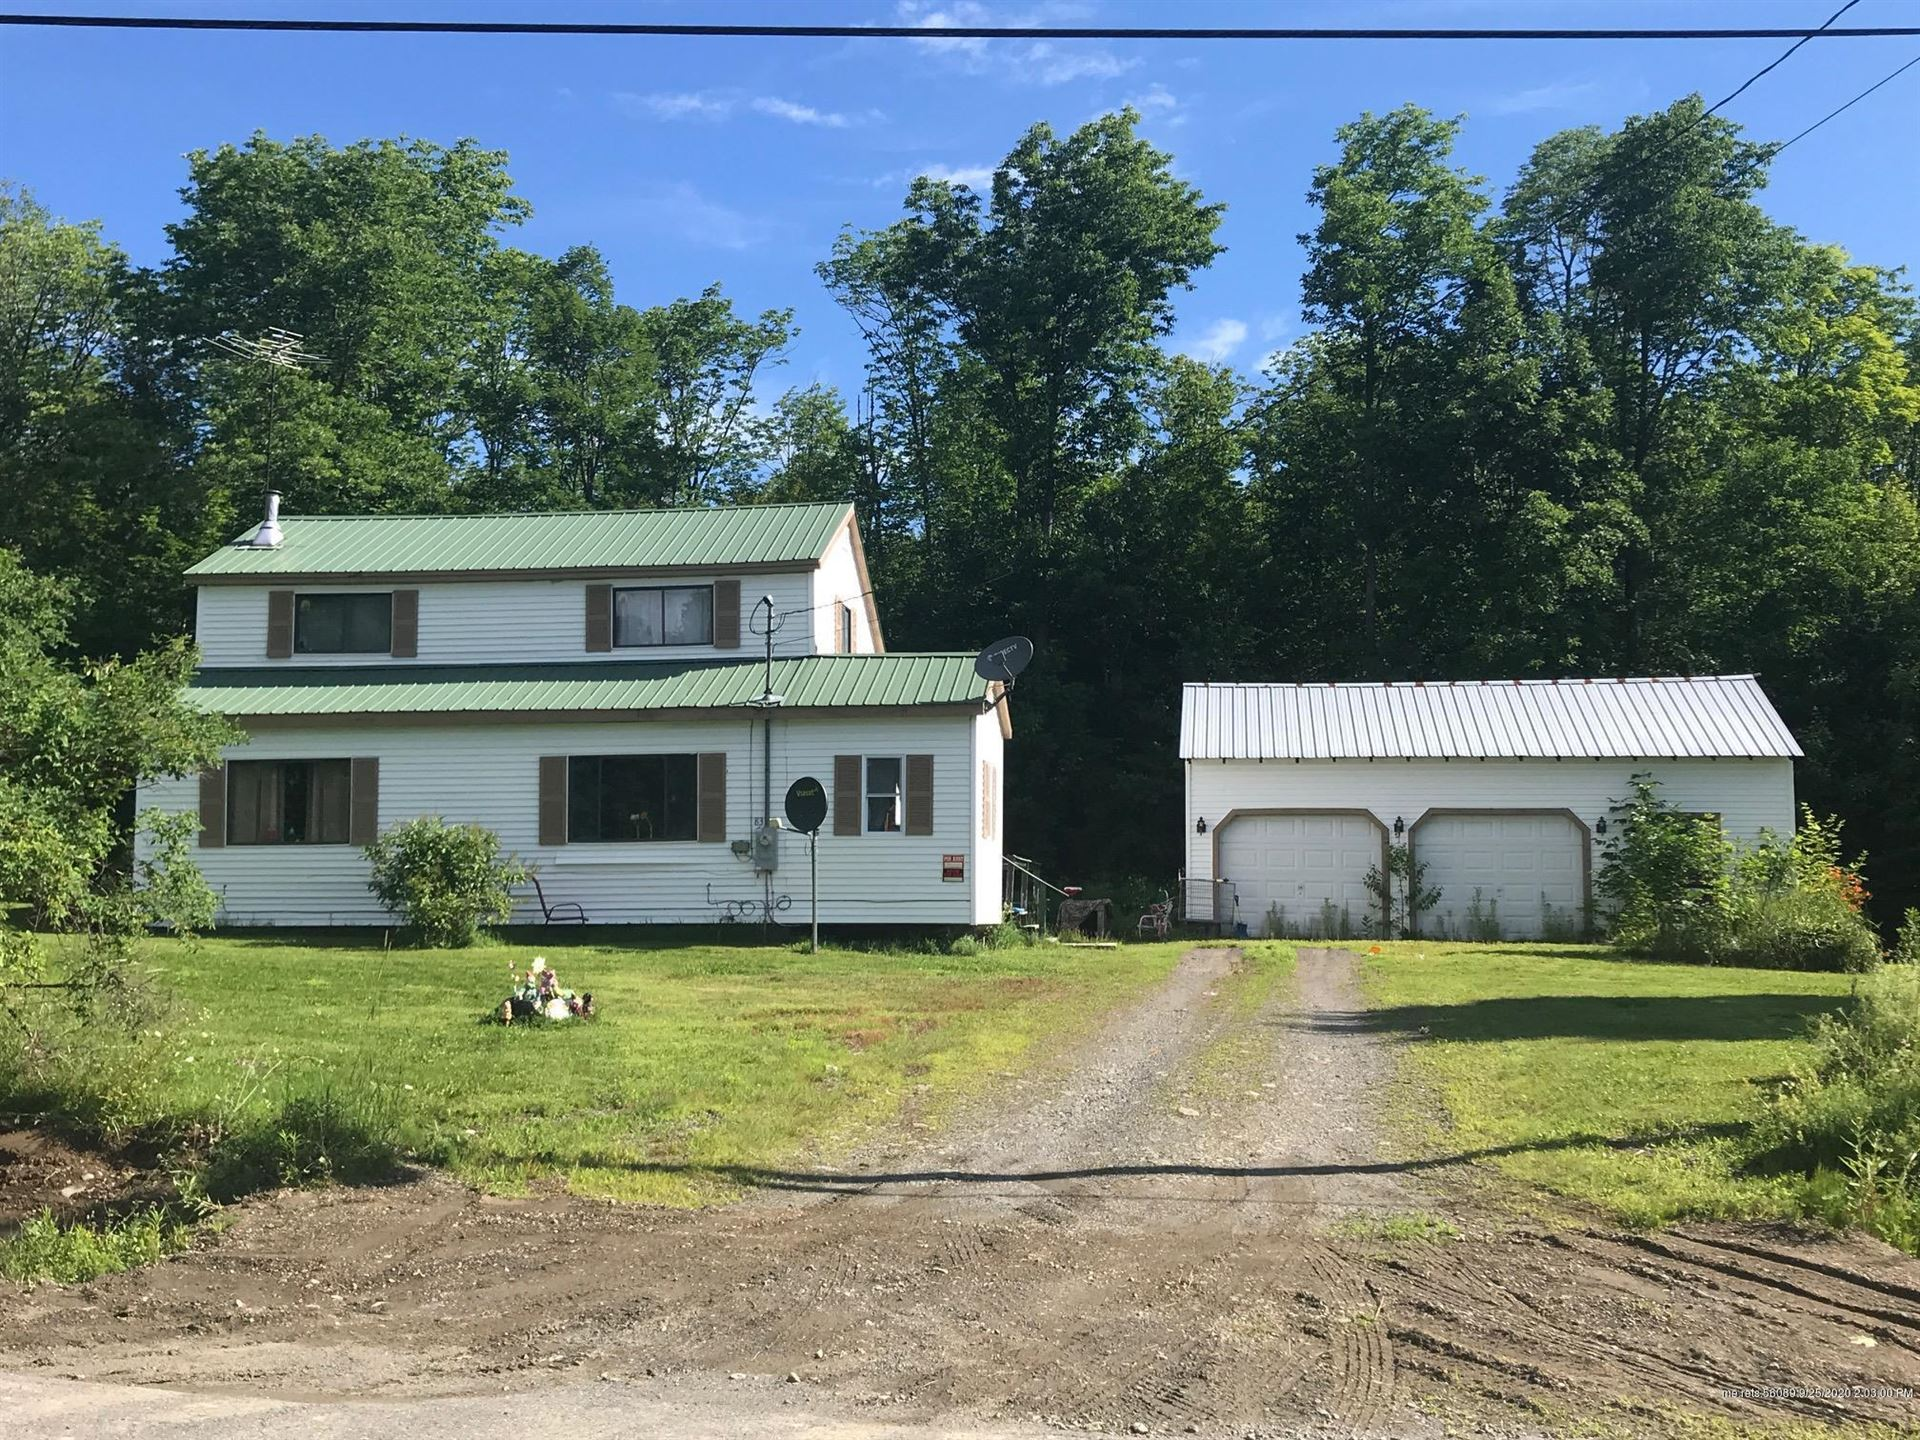 Photo of 83 North Dexter Road, Parkman, ME 04443 (MLS # 1470049)